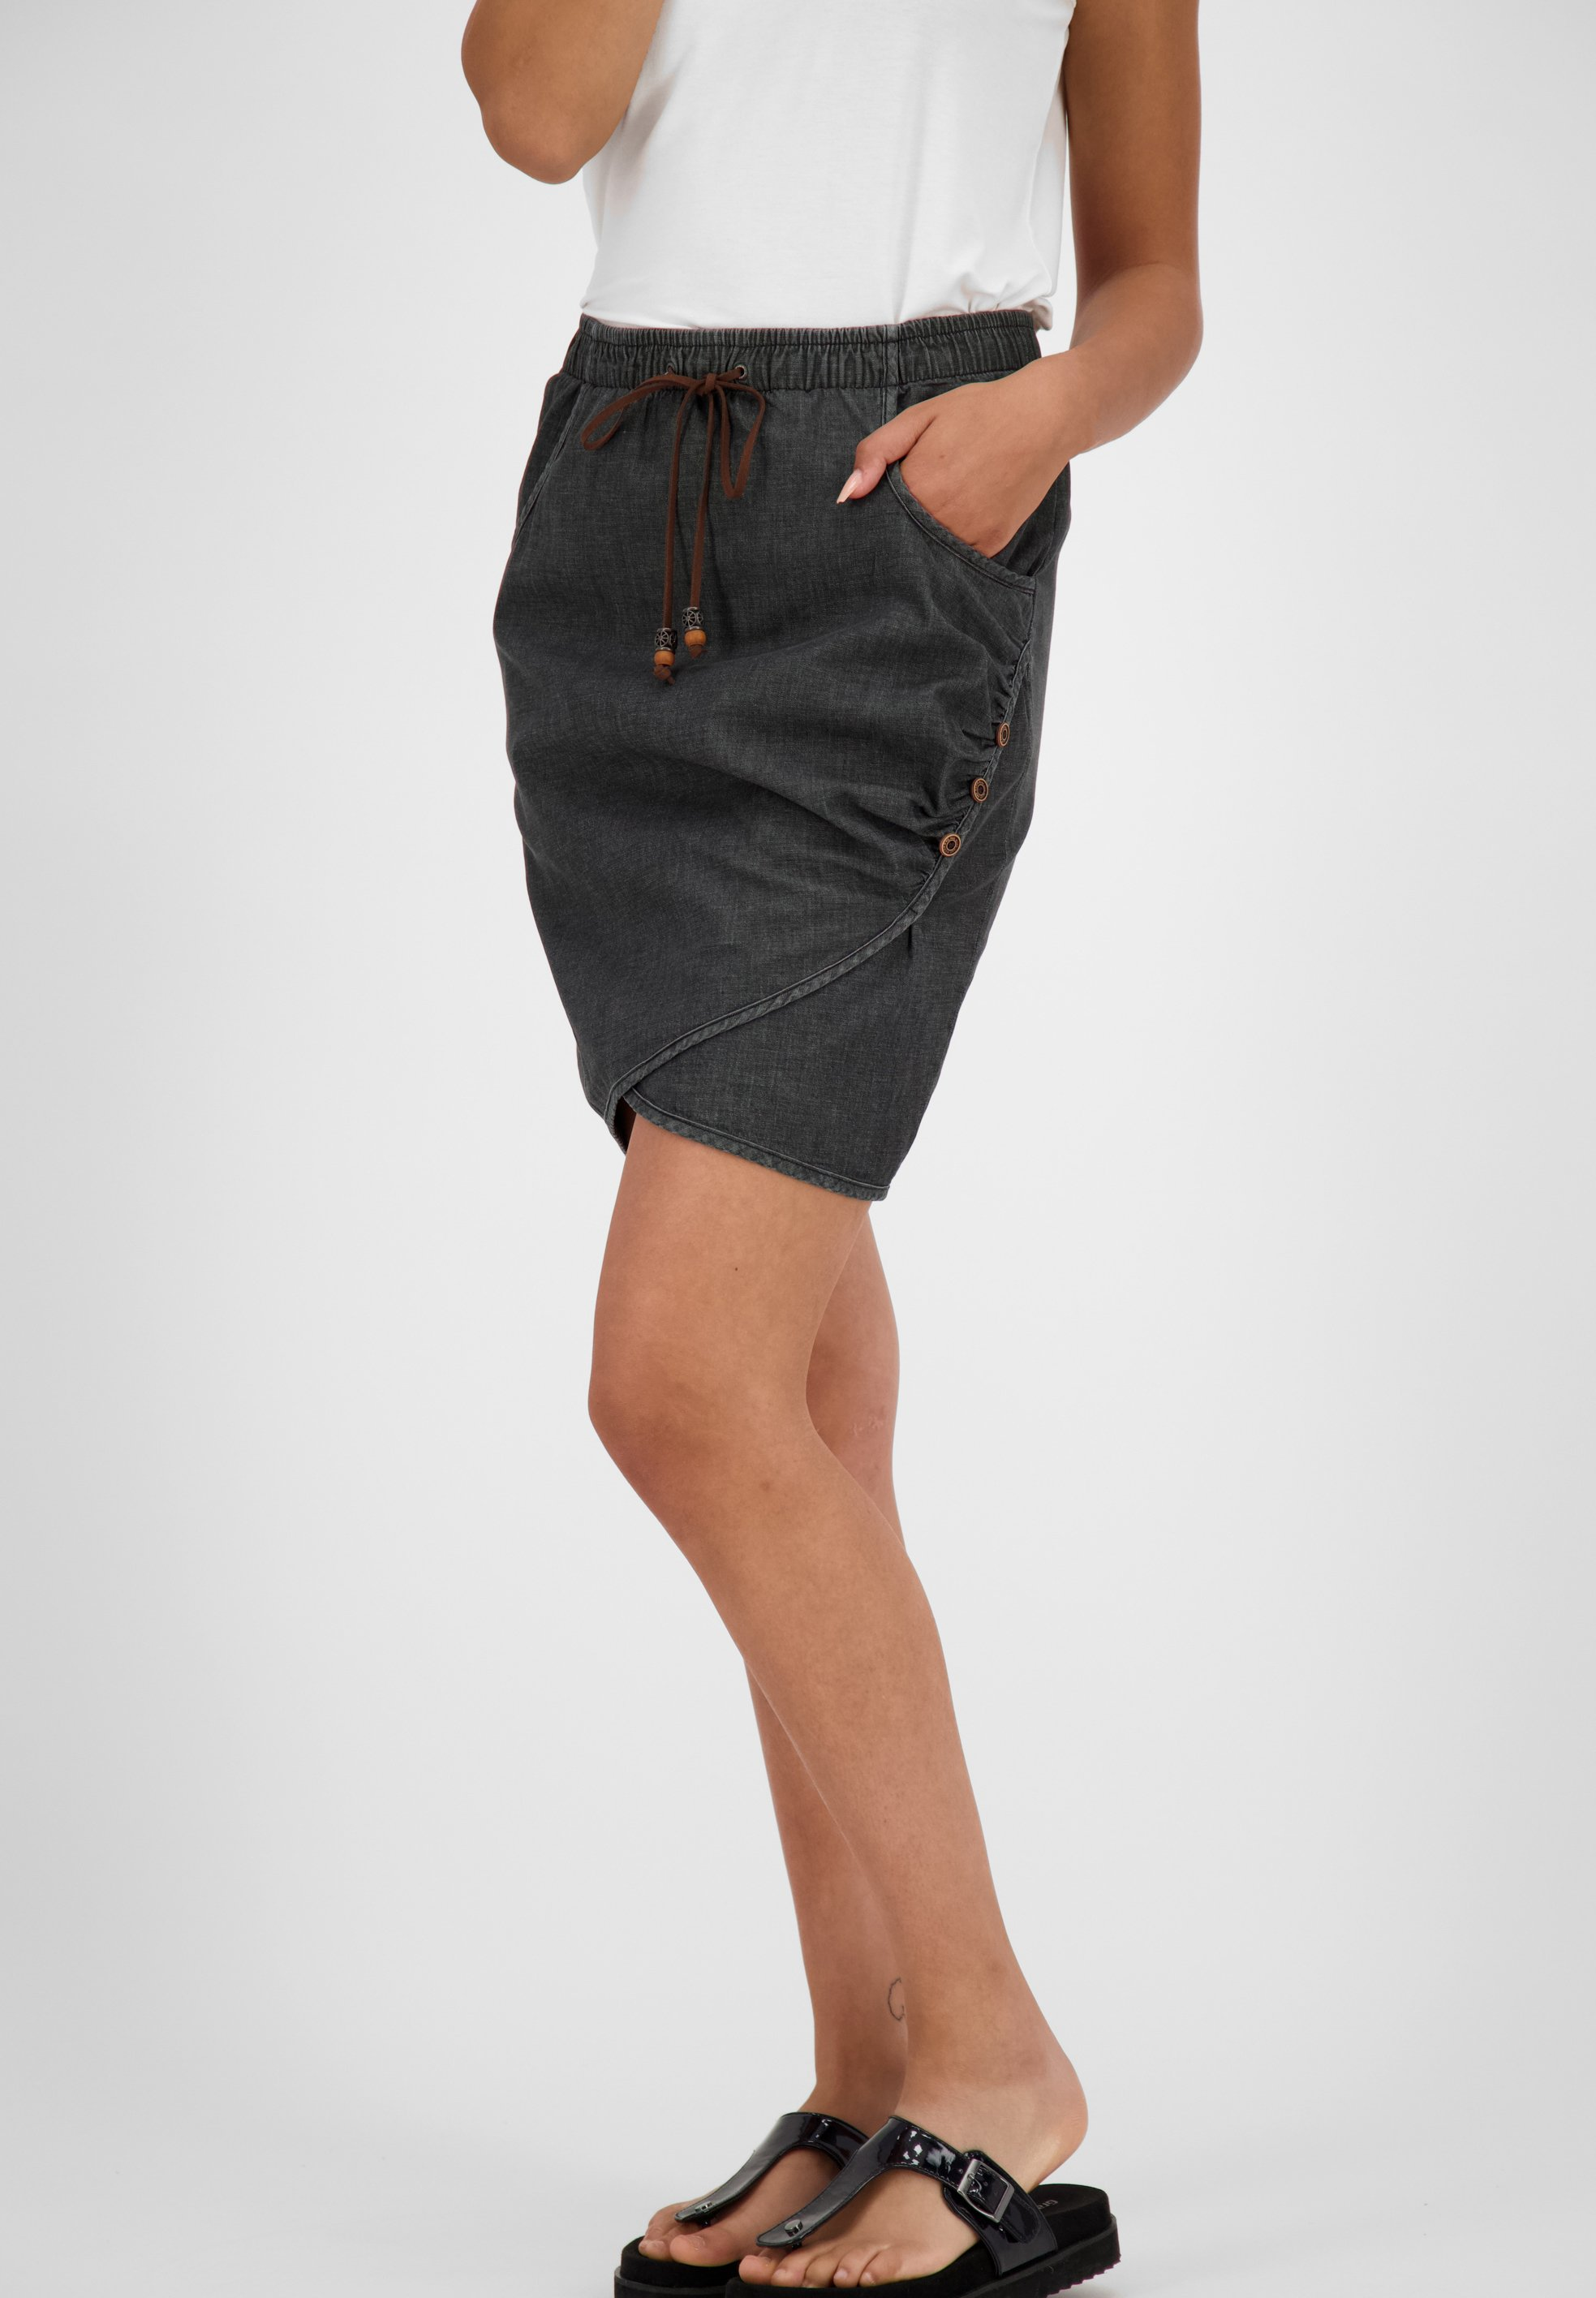 Femme LUCYAK  - Jupe portefeuille